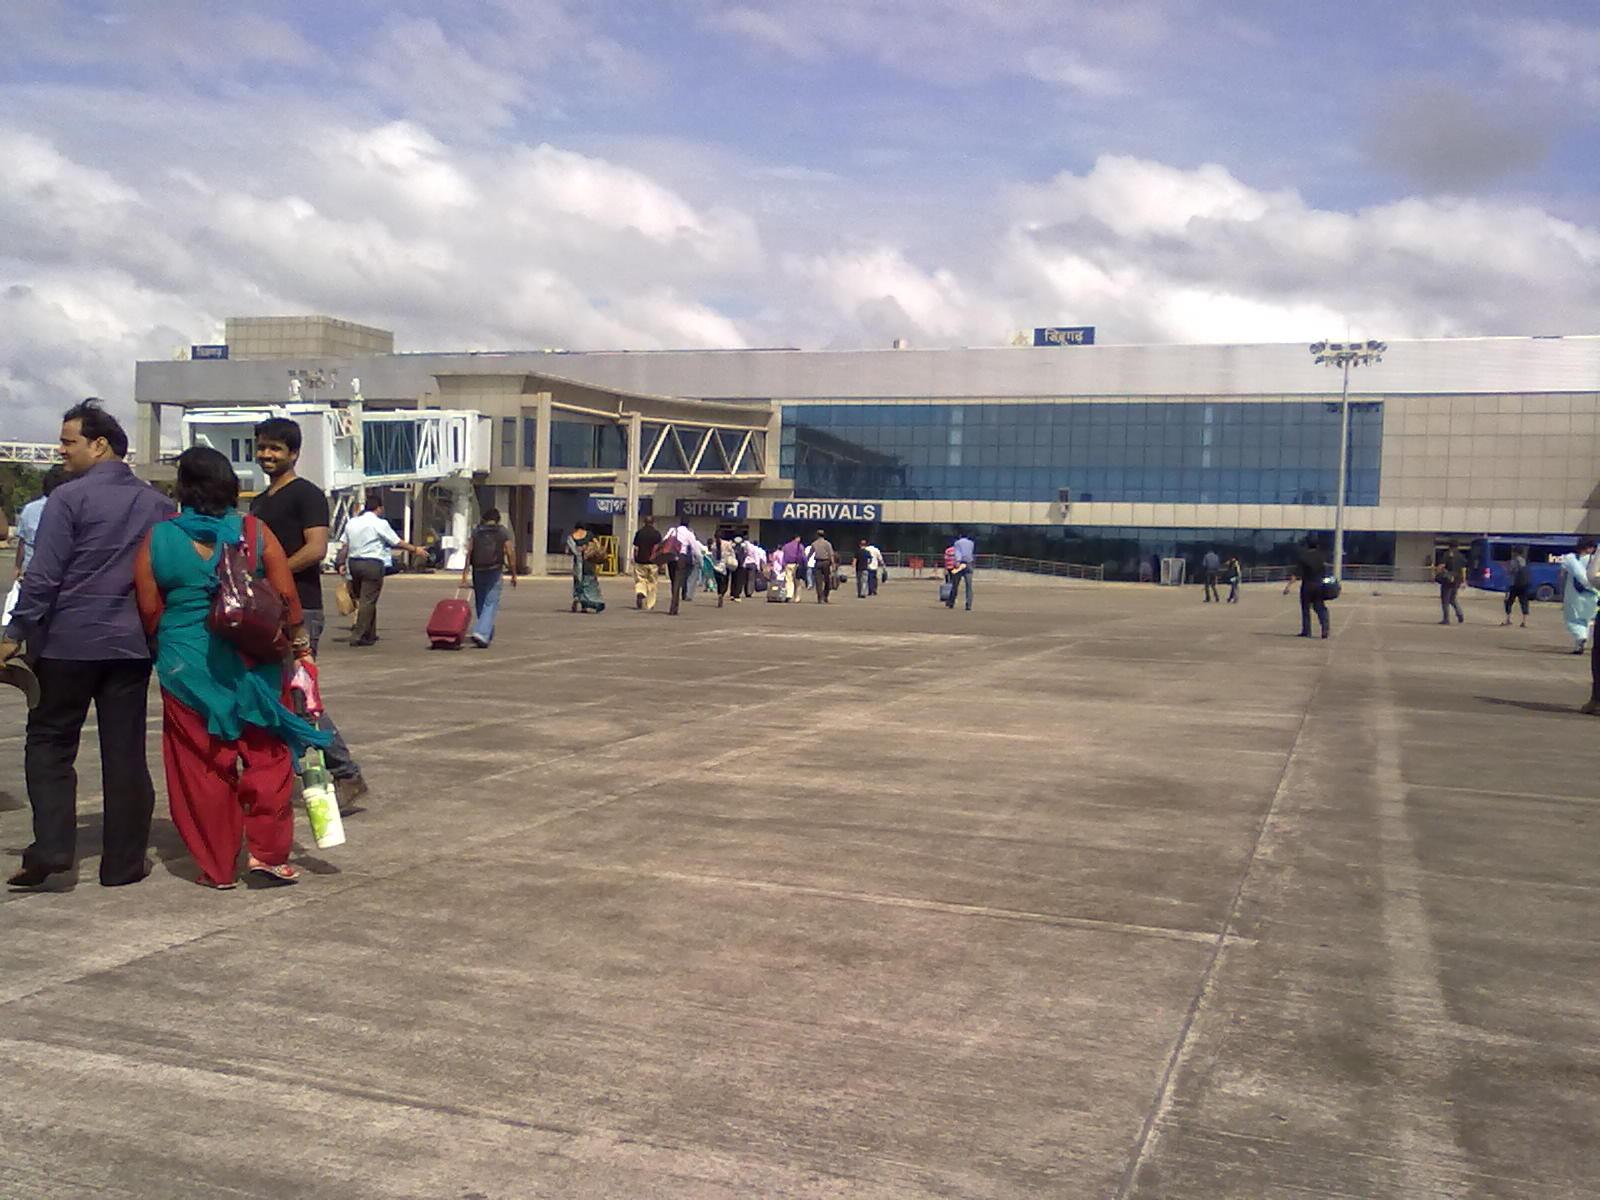 File:Dibrugarh Airport Arrival.jpg - Wikipedia, the free encyclopedia: en.wikipedia.org/wiki/File:Dibrugarh_Airport_Arrival.jpg